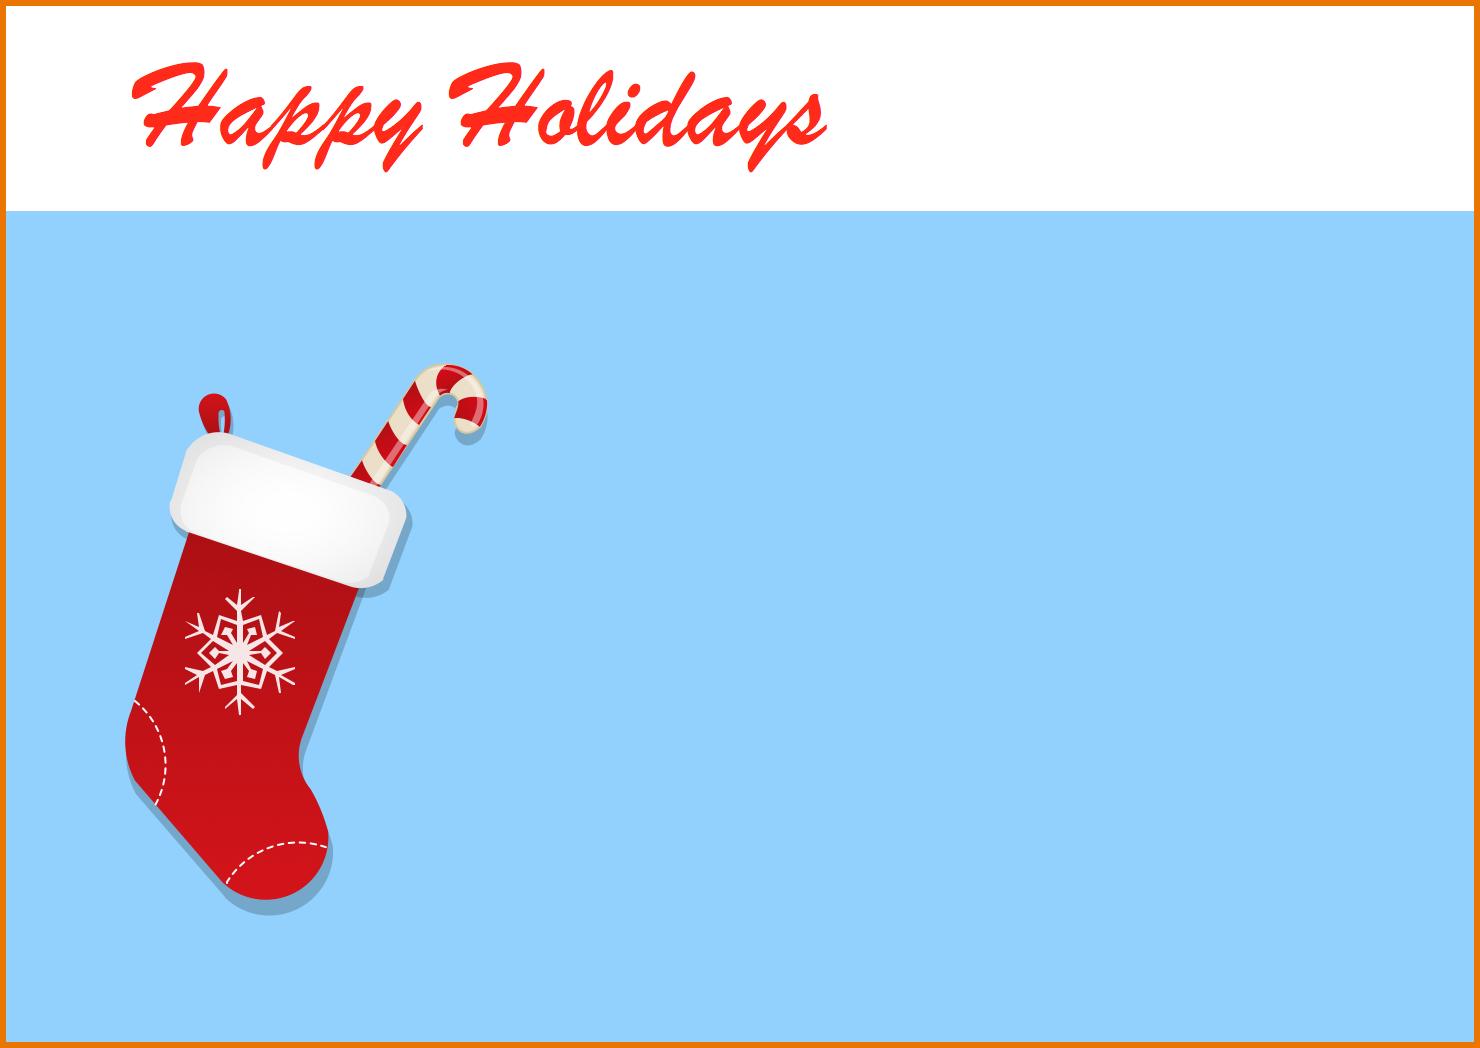 Templates  clipart christmas card Template Holidays Christmas com Holiday